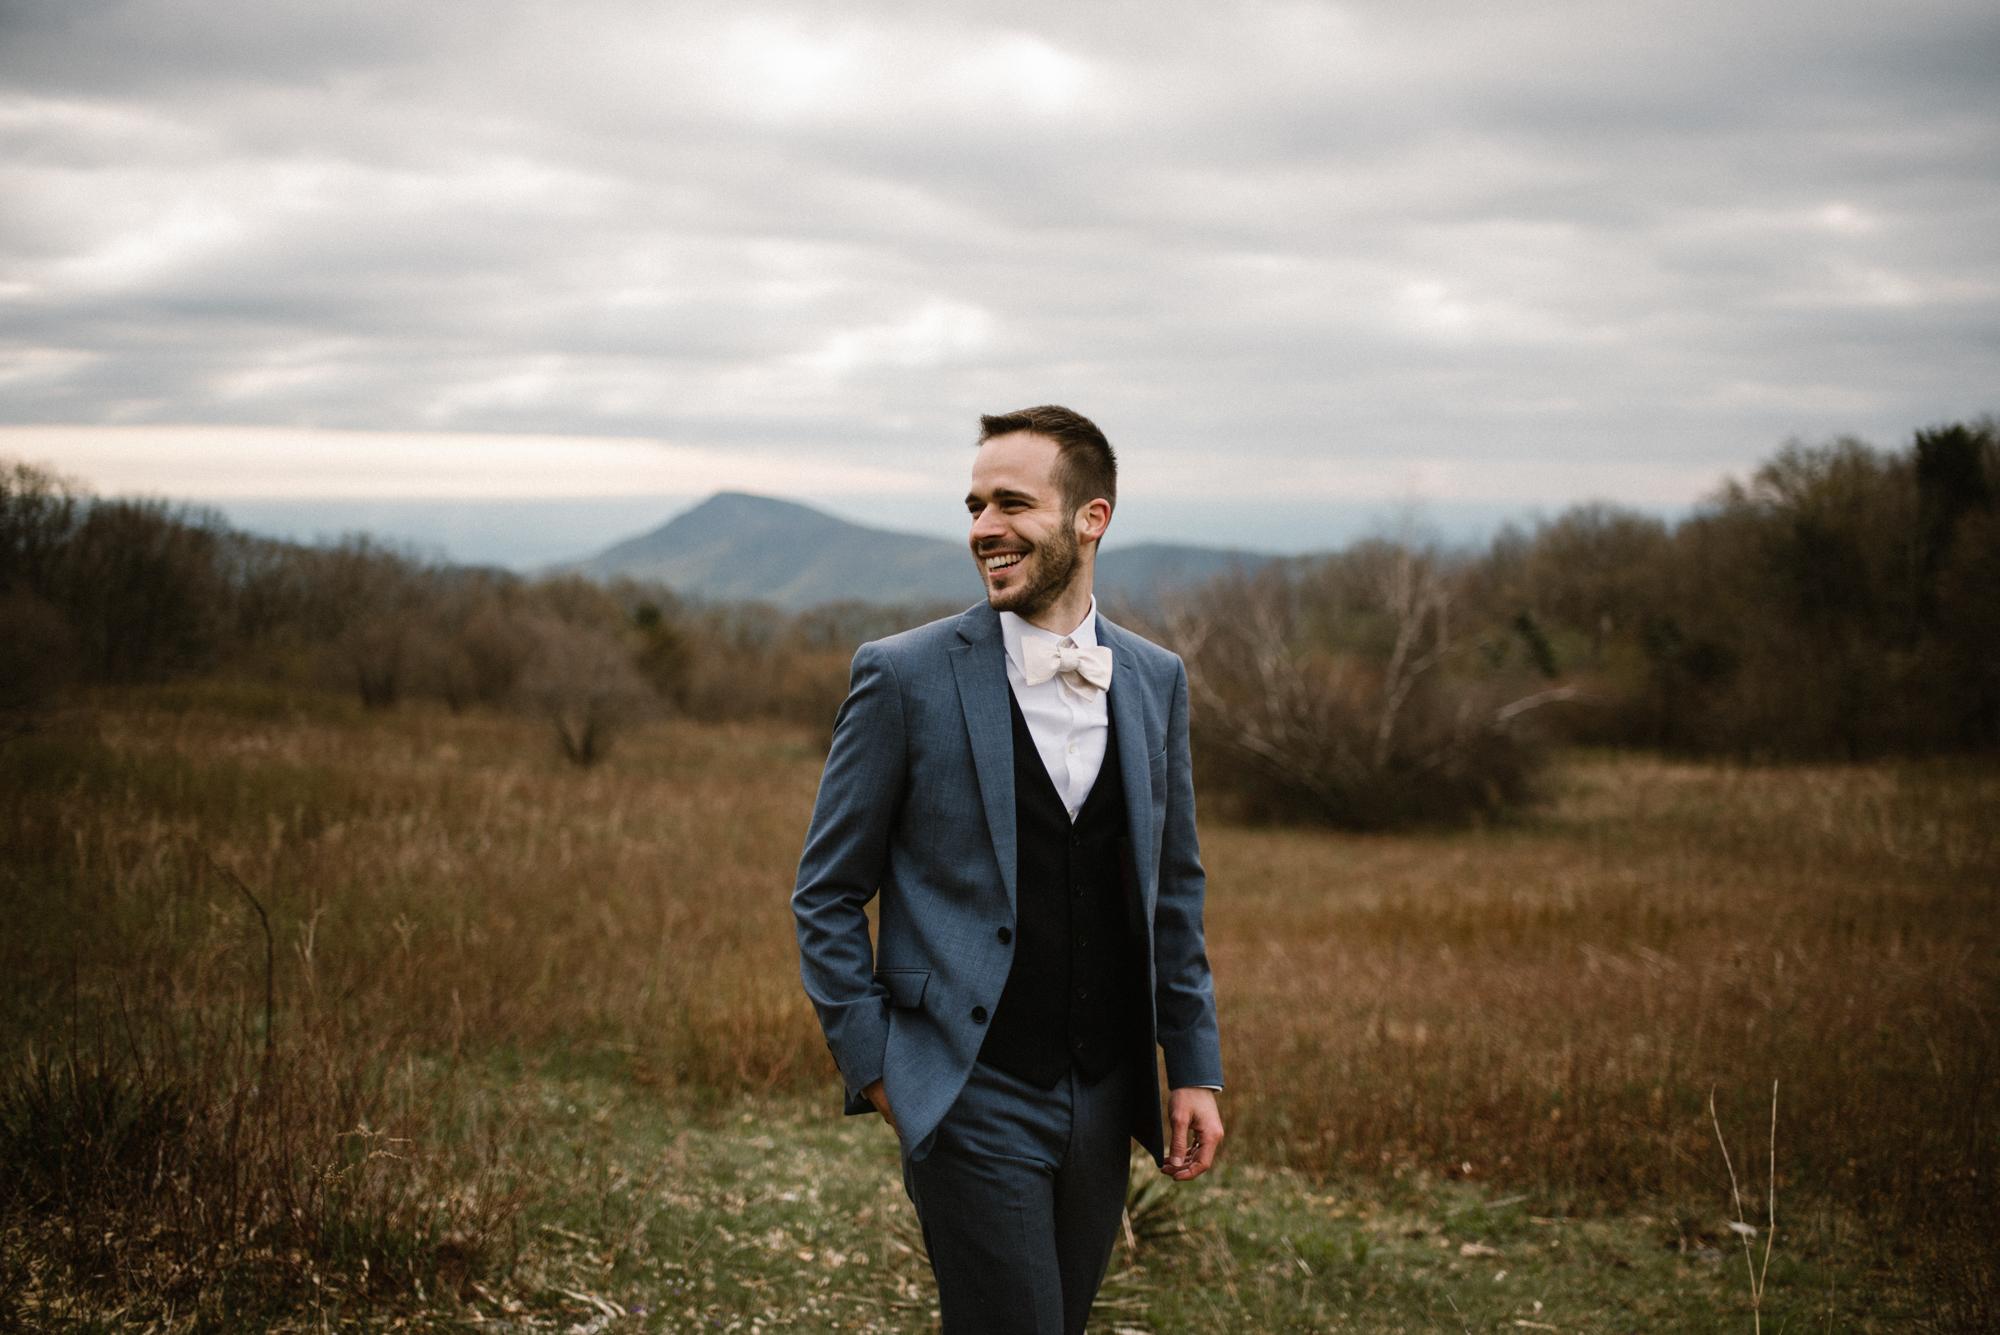 Paula and Andrew - Small Adventurous Wedding in Shenandoah National Park - Blue Ridge Mountain Wedding - White Sails Creative - Mountain Elopement_41.jpg